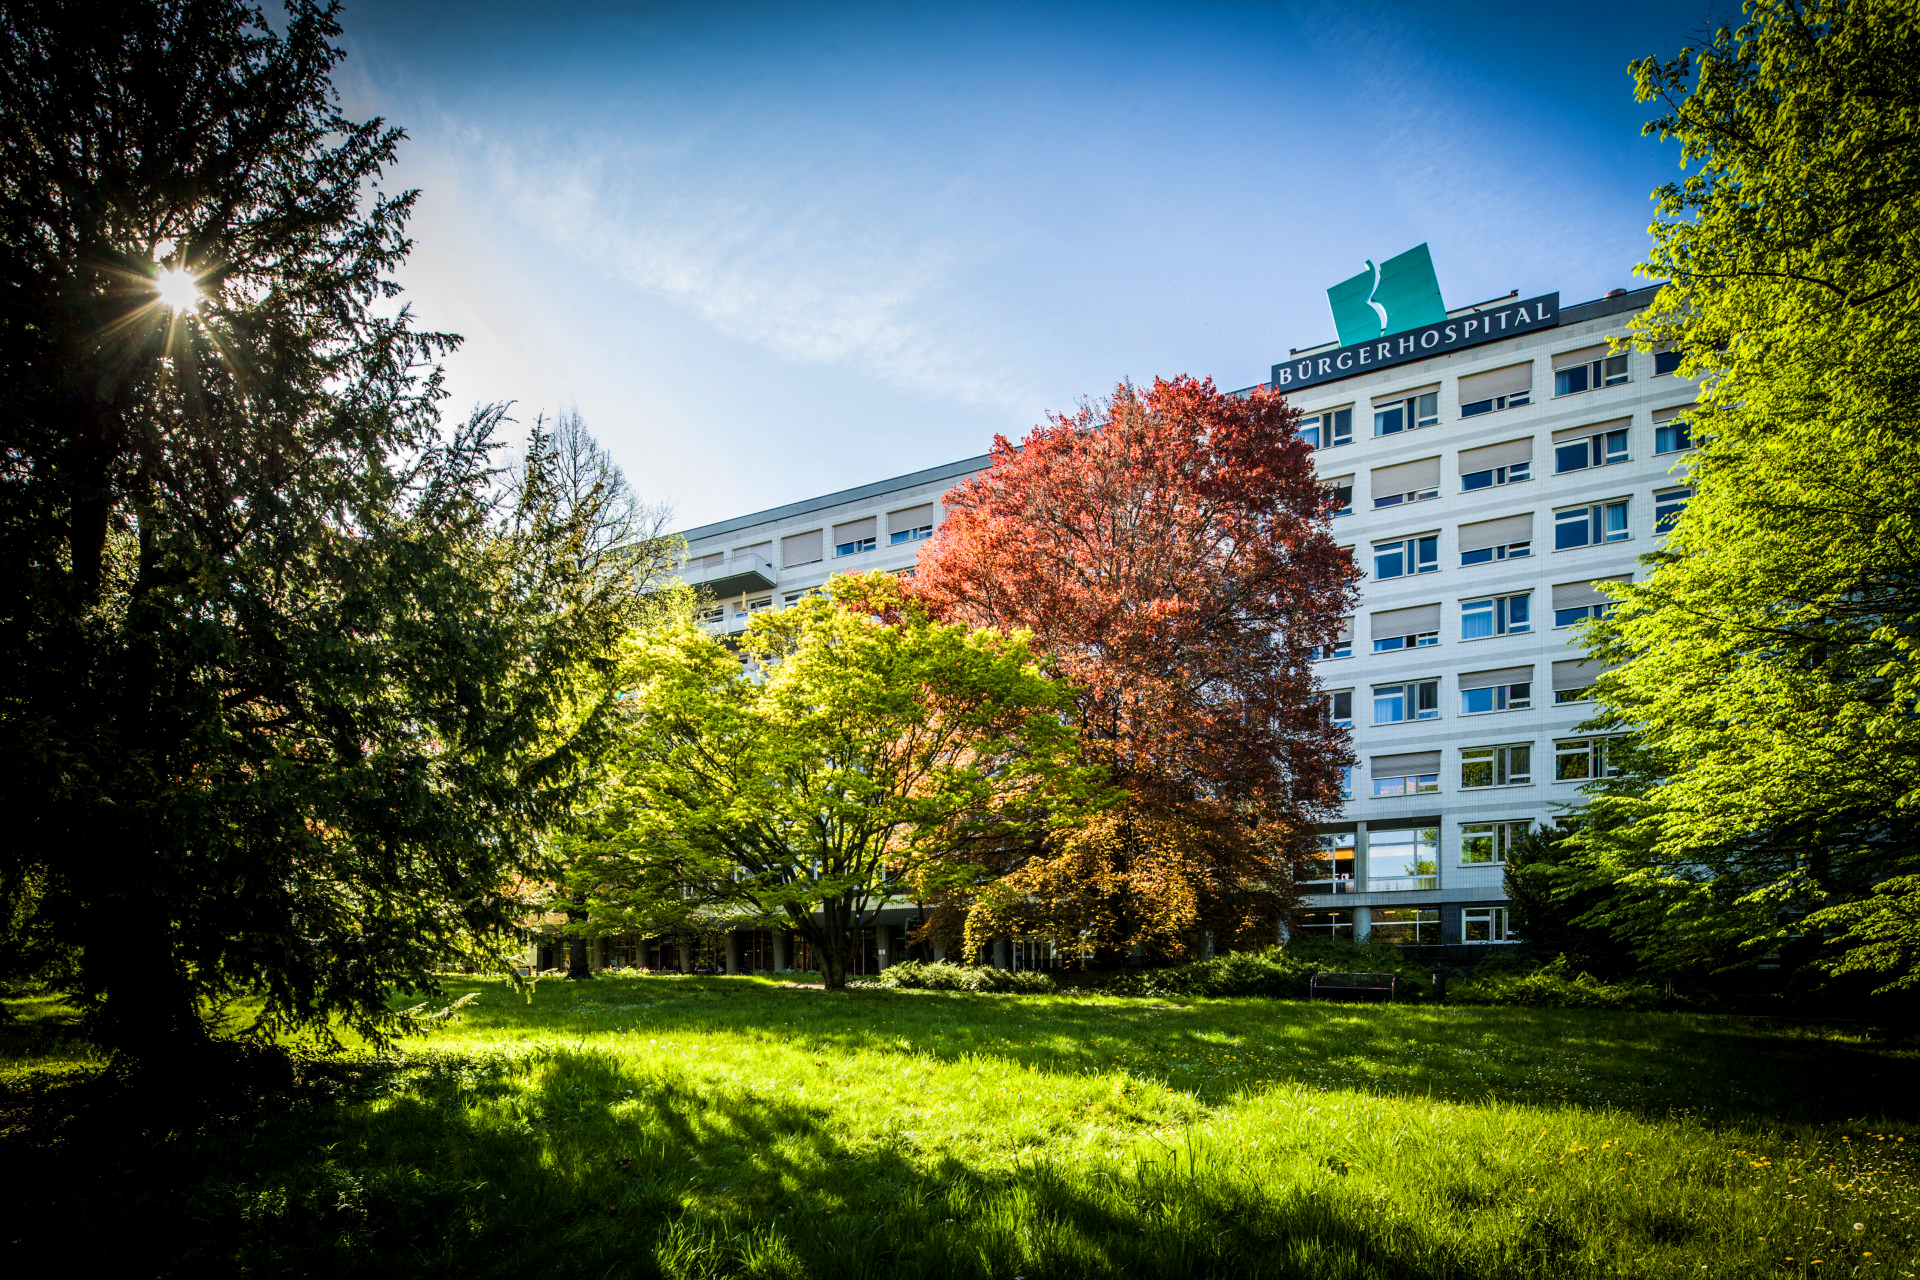 Ehemaliges Bürgerhospital, Stuttgart